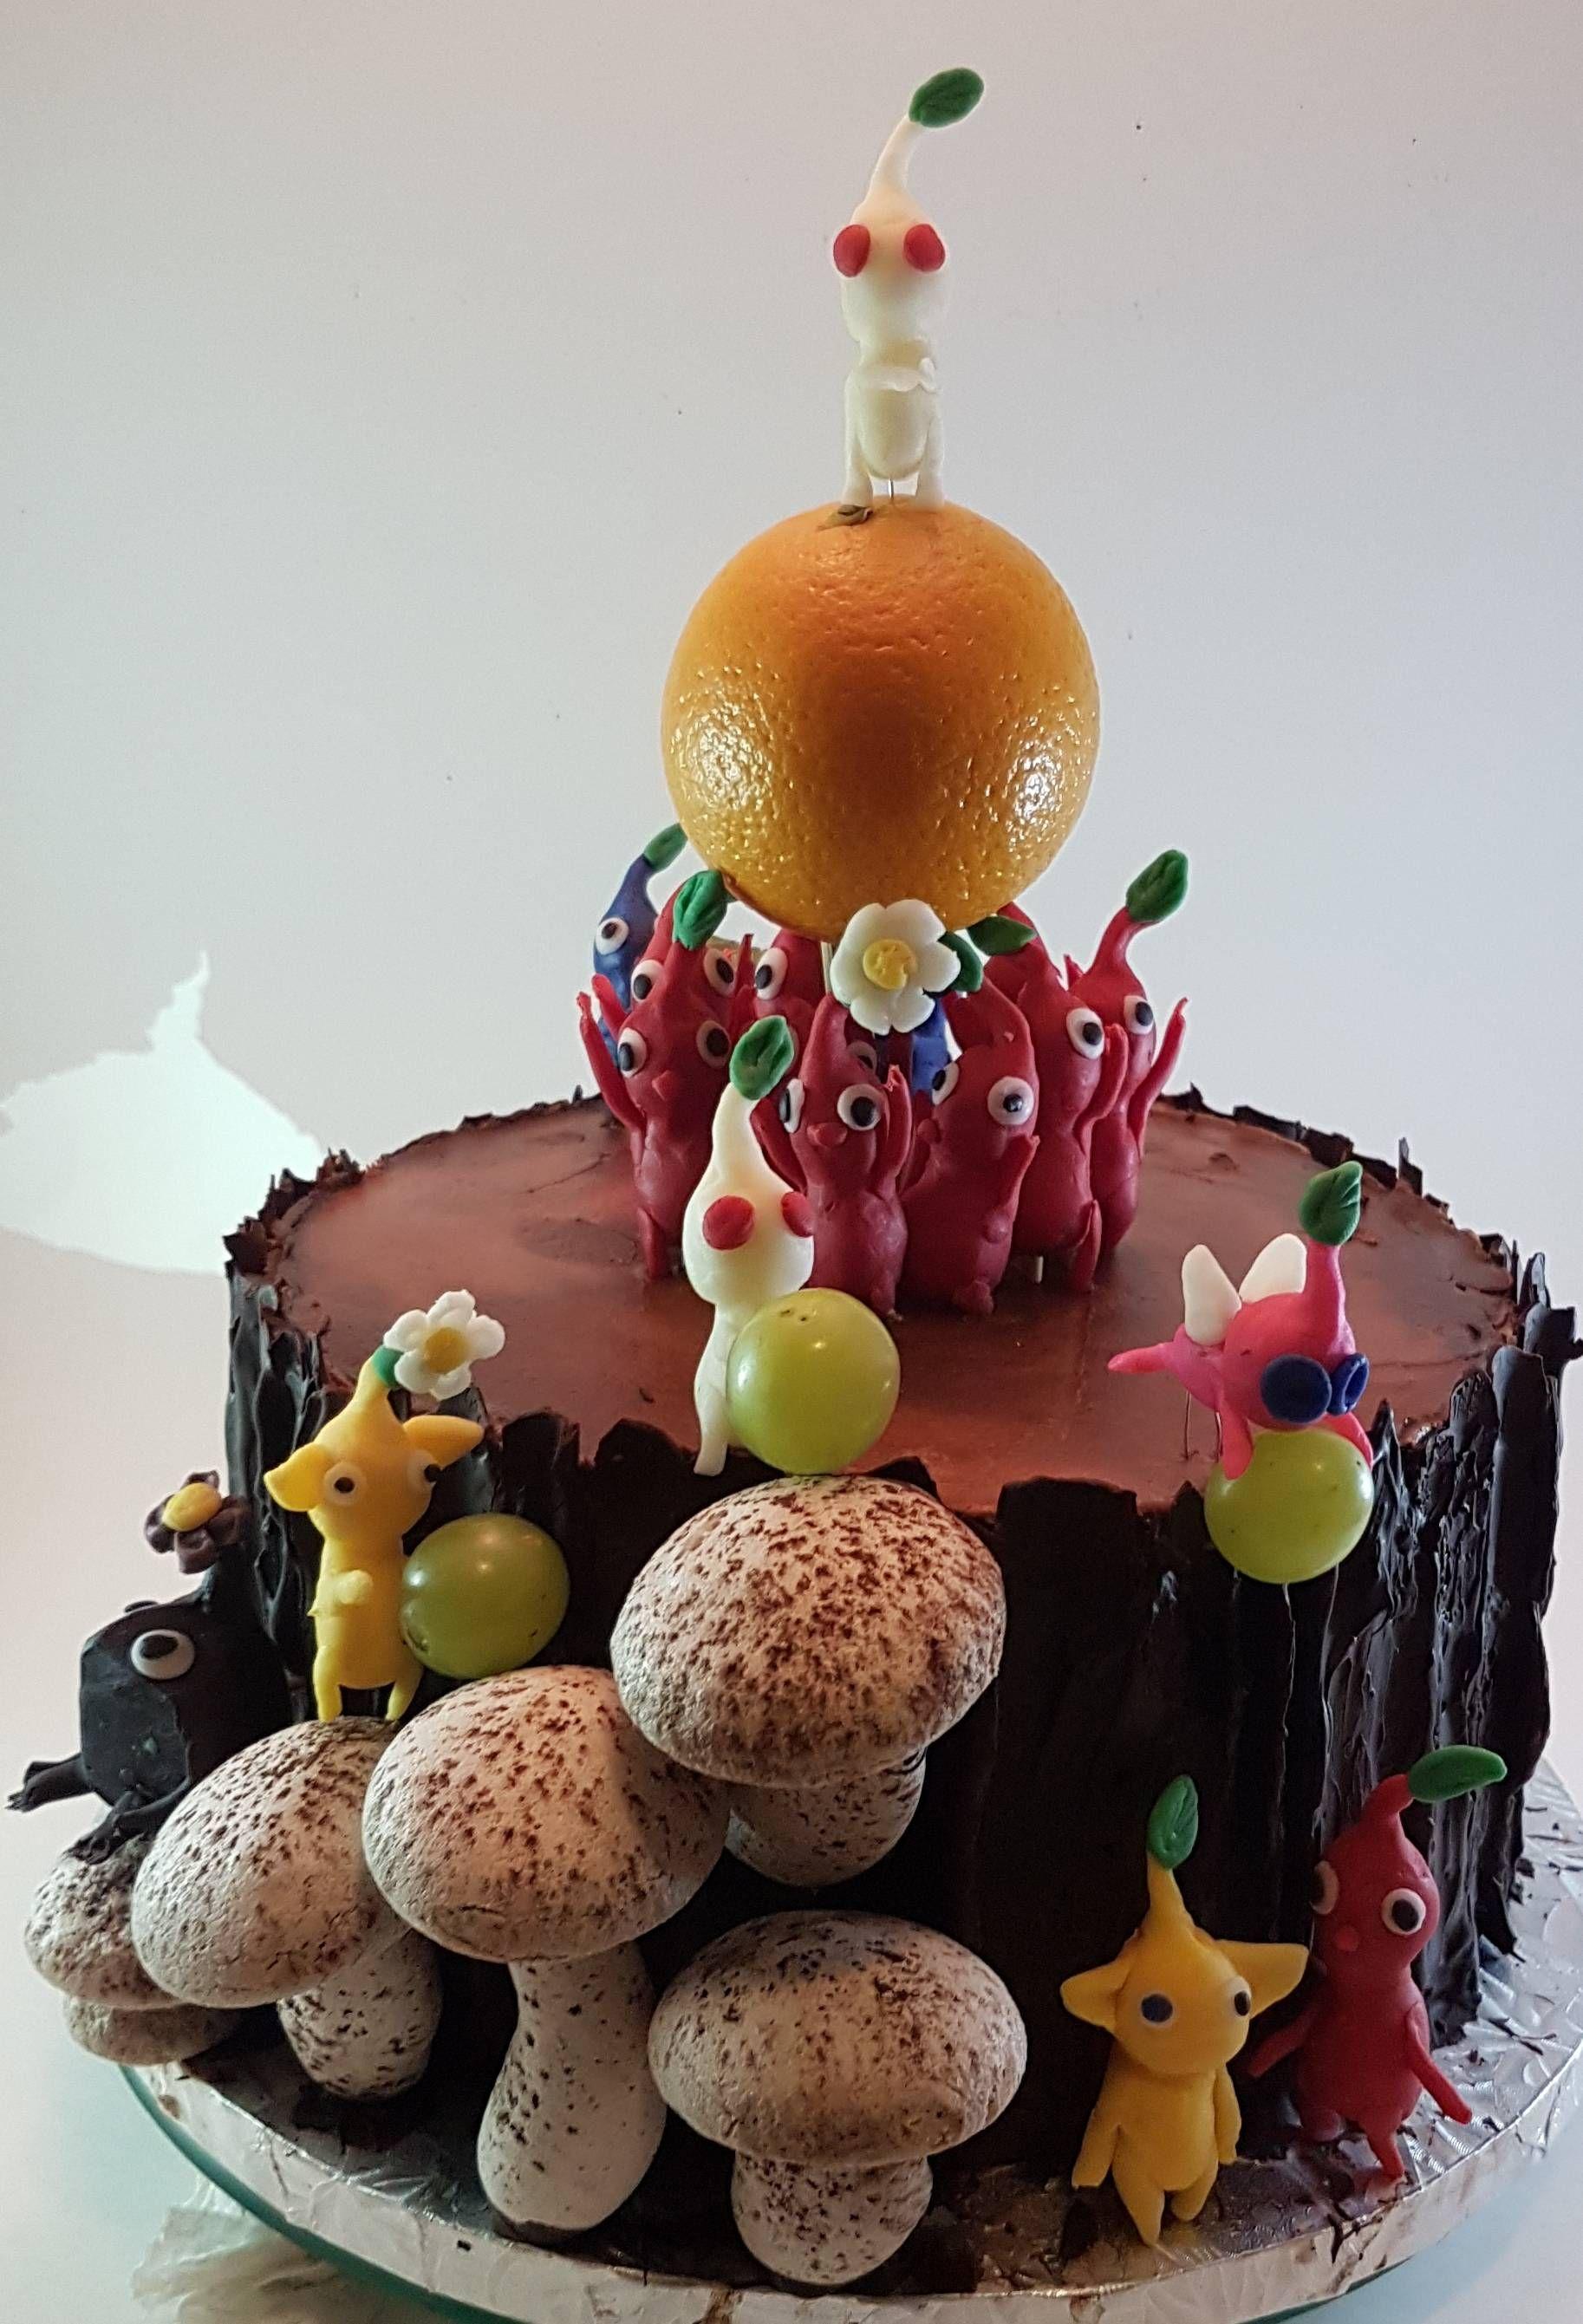 Homemade Dark Chocolate Cake With Swiss Meringue Buttercream Bark Mushrooms Candy Clay Characters Real Fruit Pikmin Themed Birthday